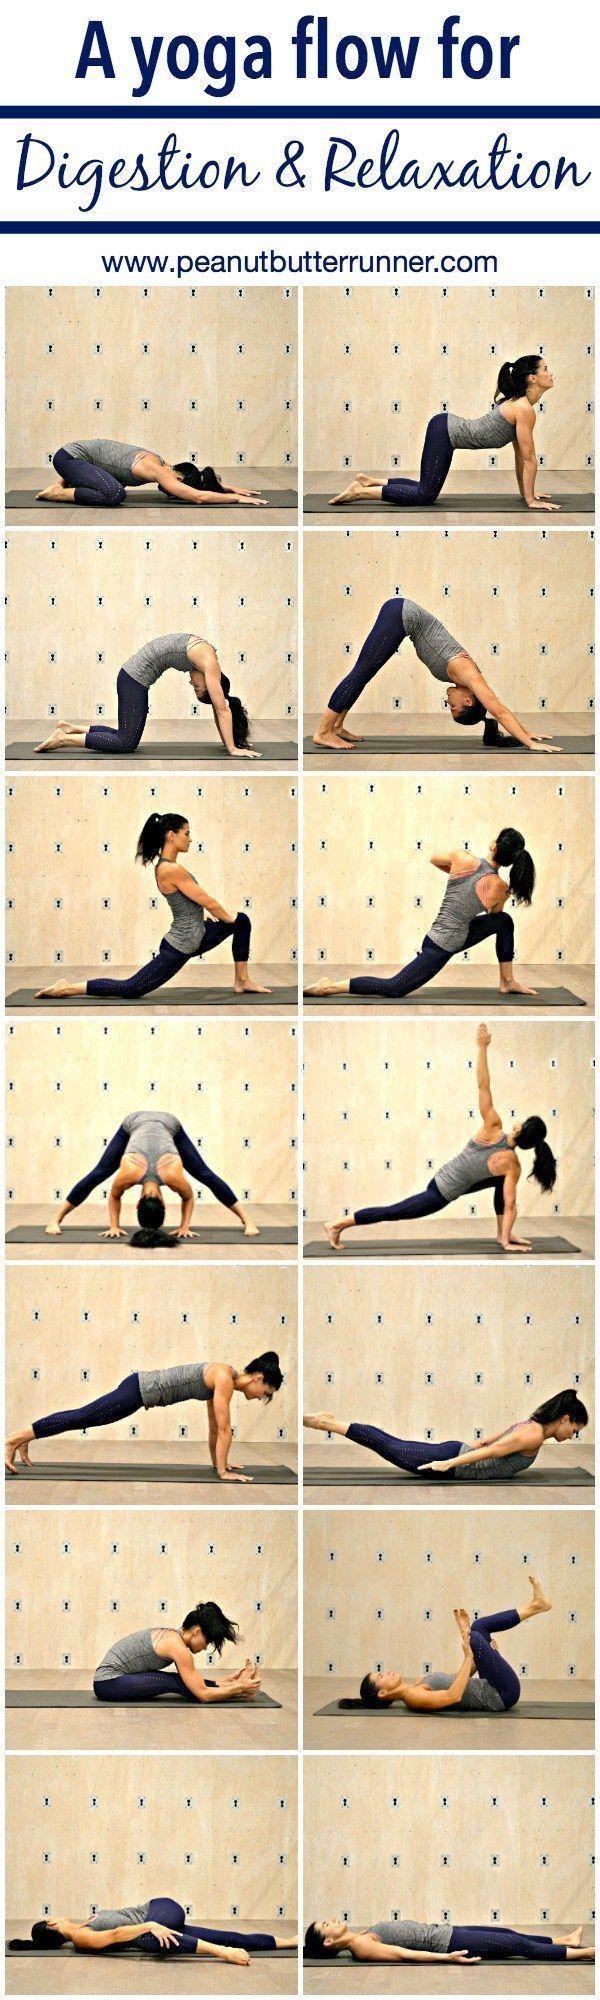 Yoga Flow for Digestive Health & Relaxation | Peanut Butter Runner | Bloglovin'